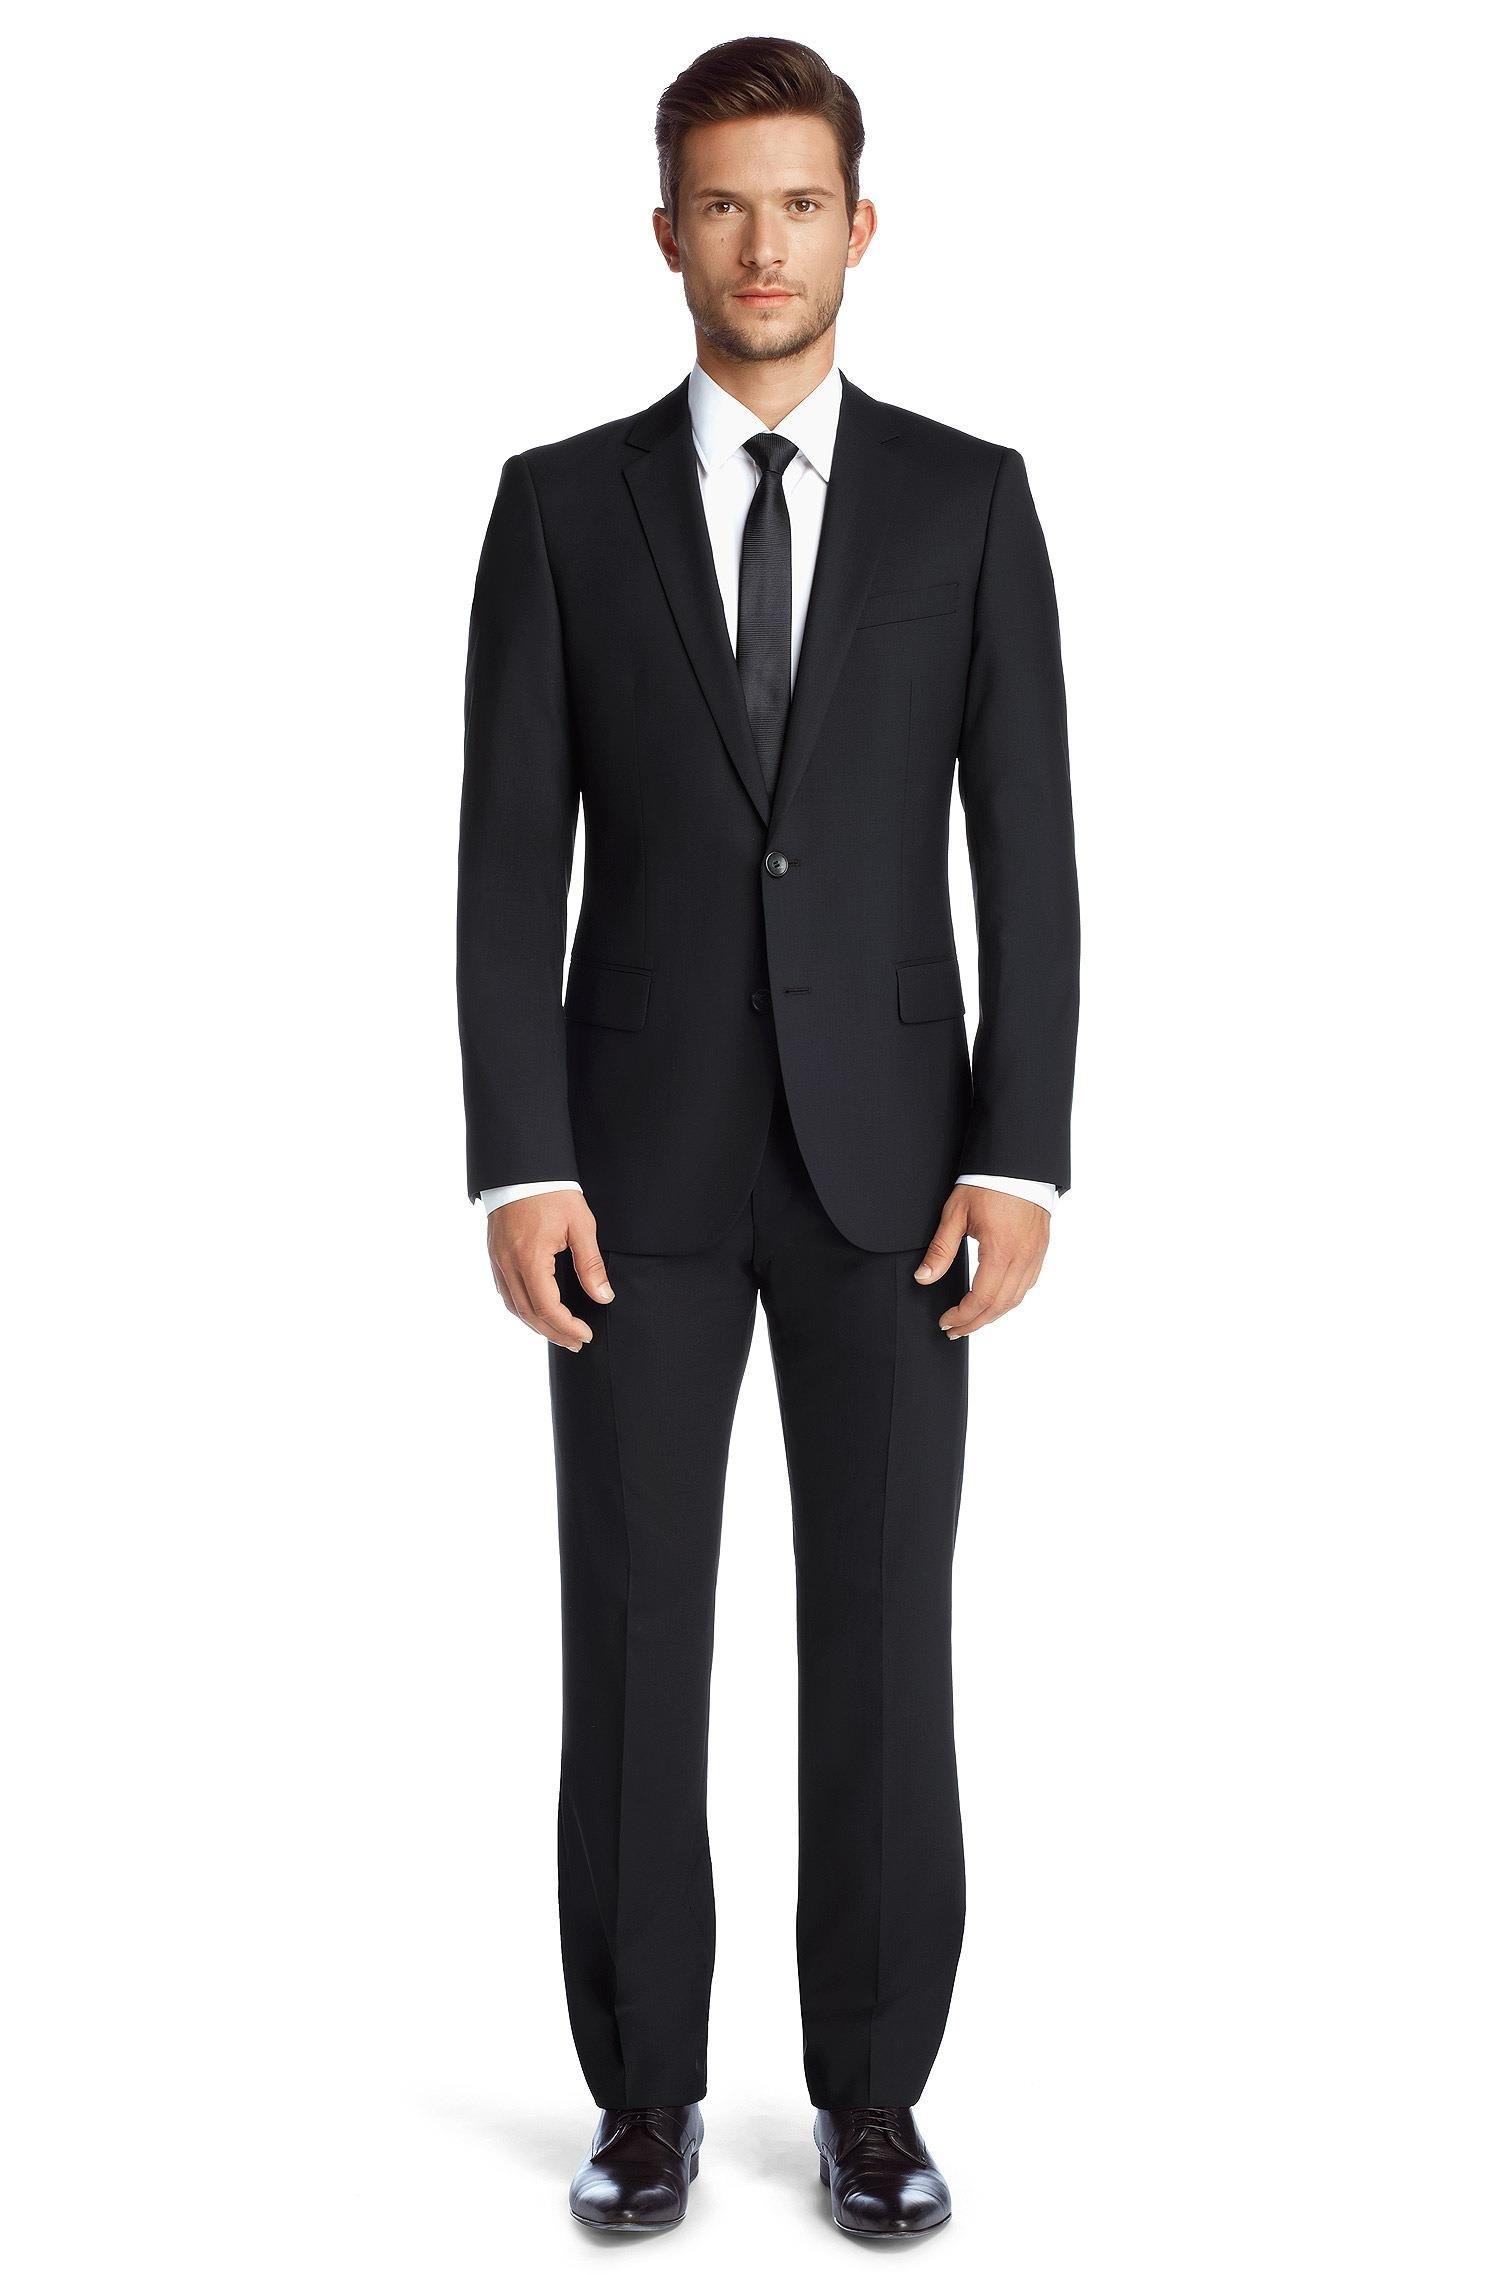 hugo boss slim fit suit amaro heise my style slim. Black Bedroom Furniture Sets. Home Design Ideas